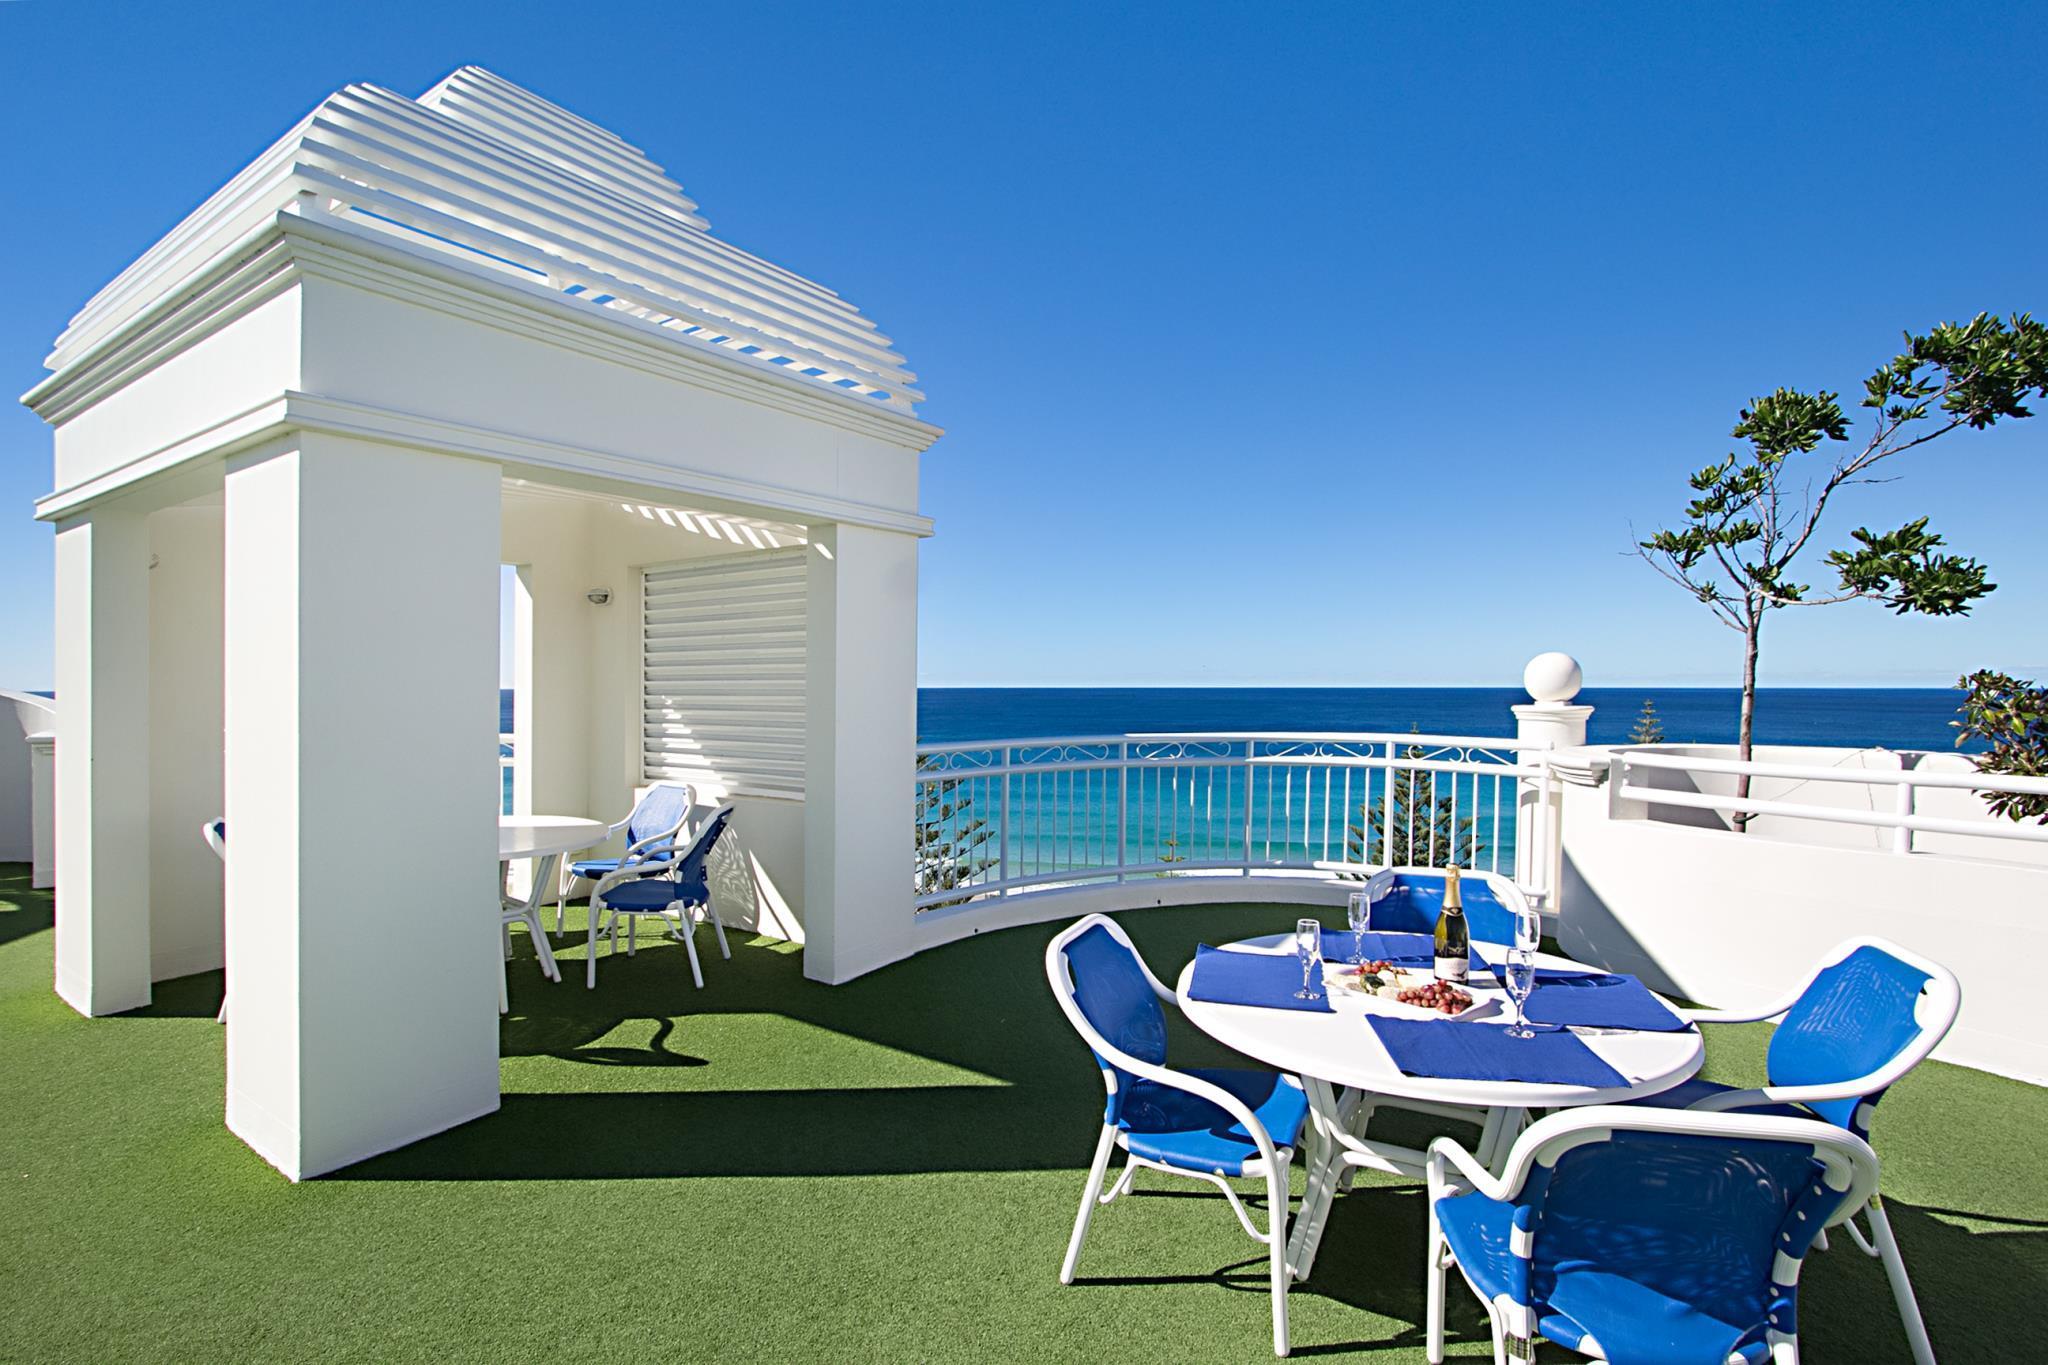 Burleigh Mediterranean Beachfront Resort, Burleigh Heads